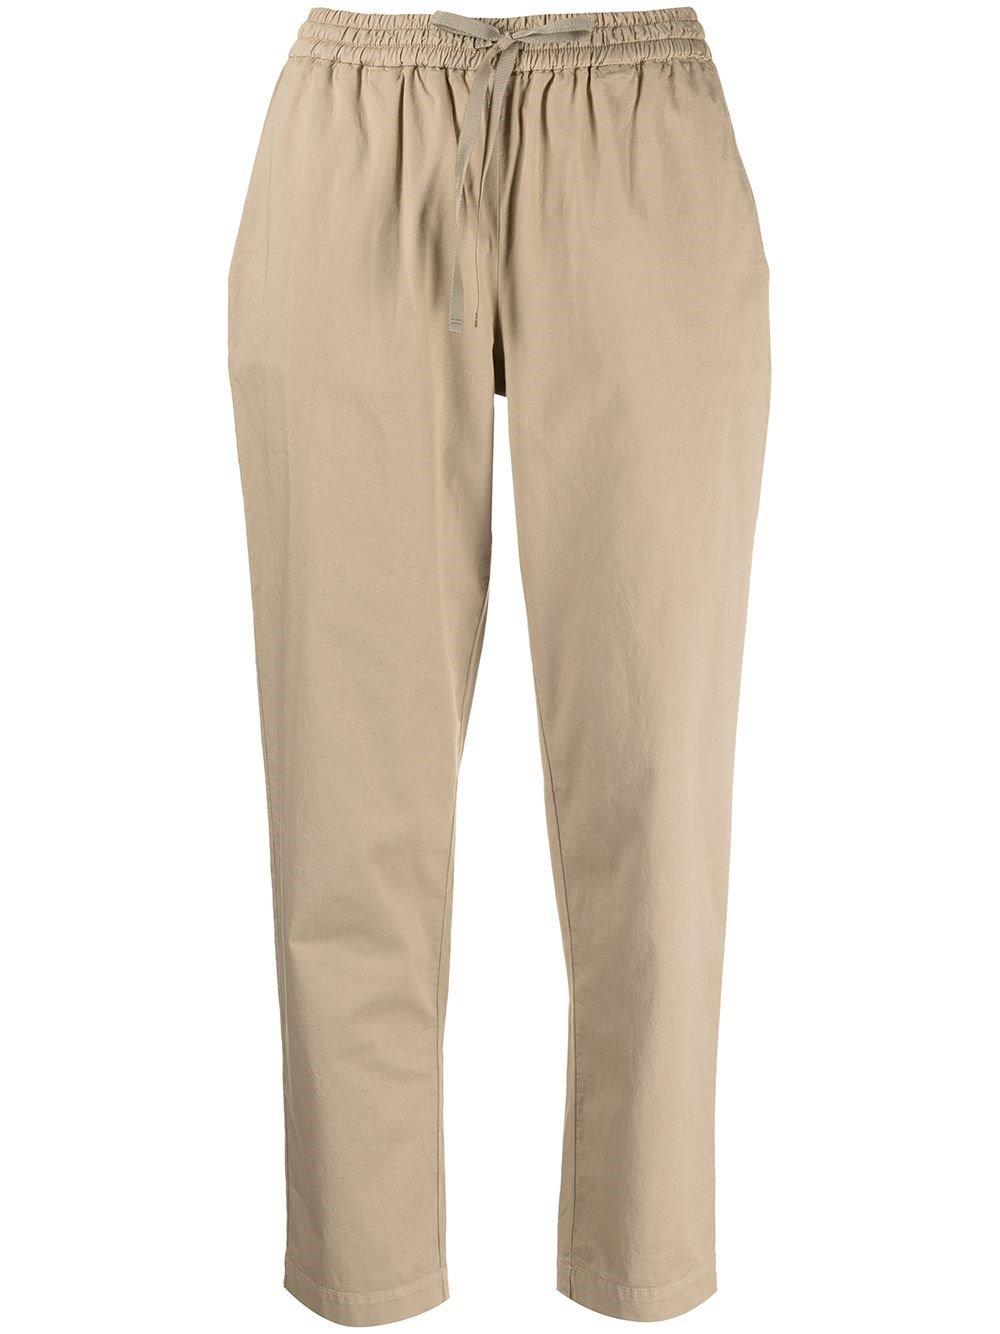 Buddy Beige Cotton Crop Pants